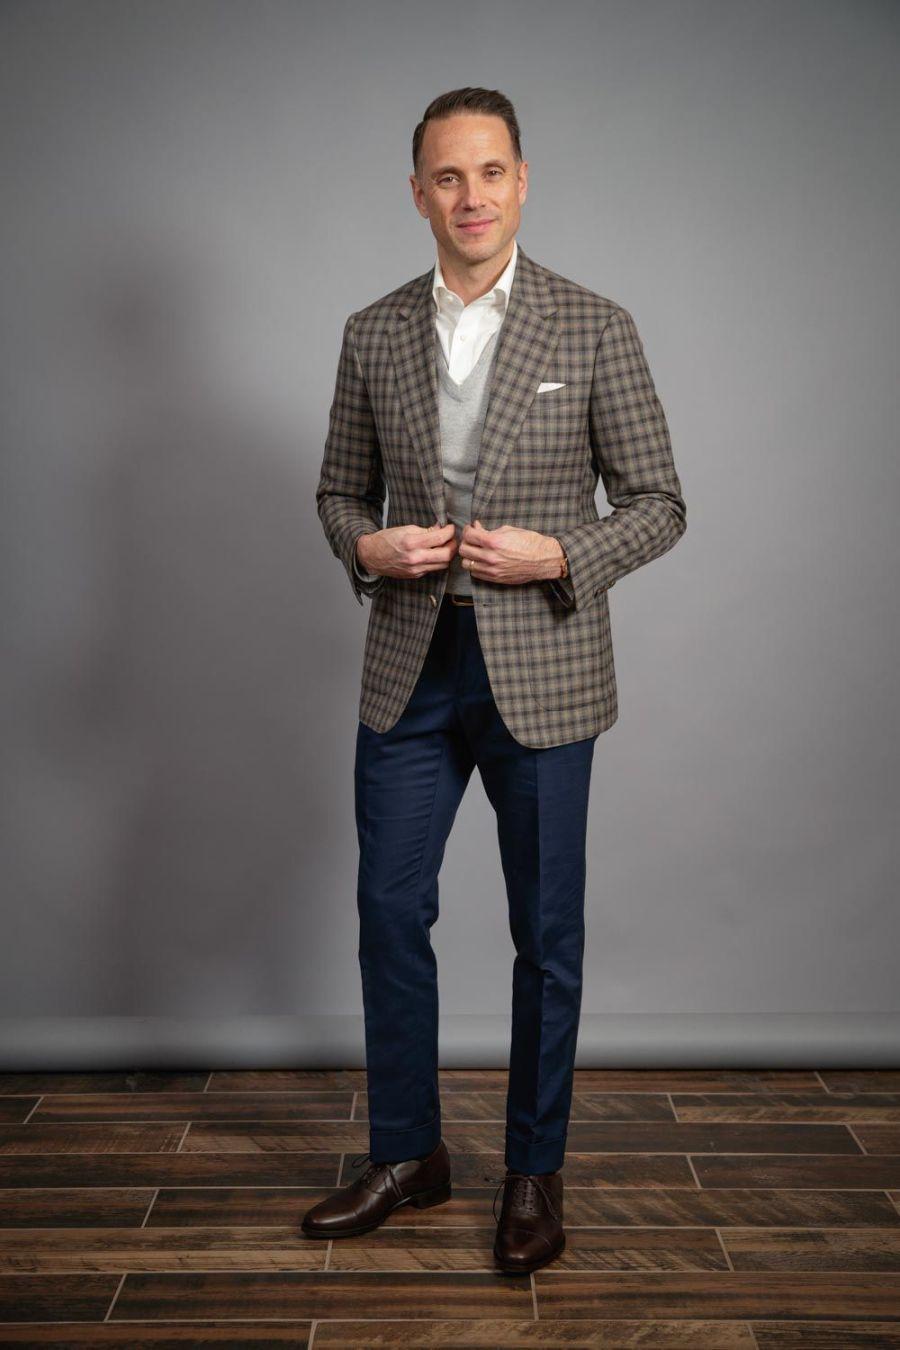 gun-club-check-jacket-blue-trousers-white-oxford-shirt-heather-grey-v-neck-sweater-for-men